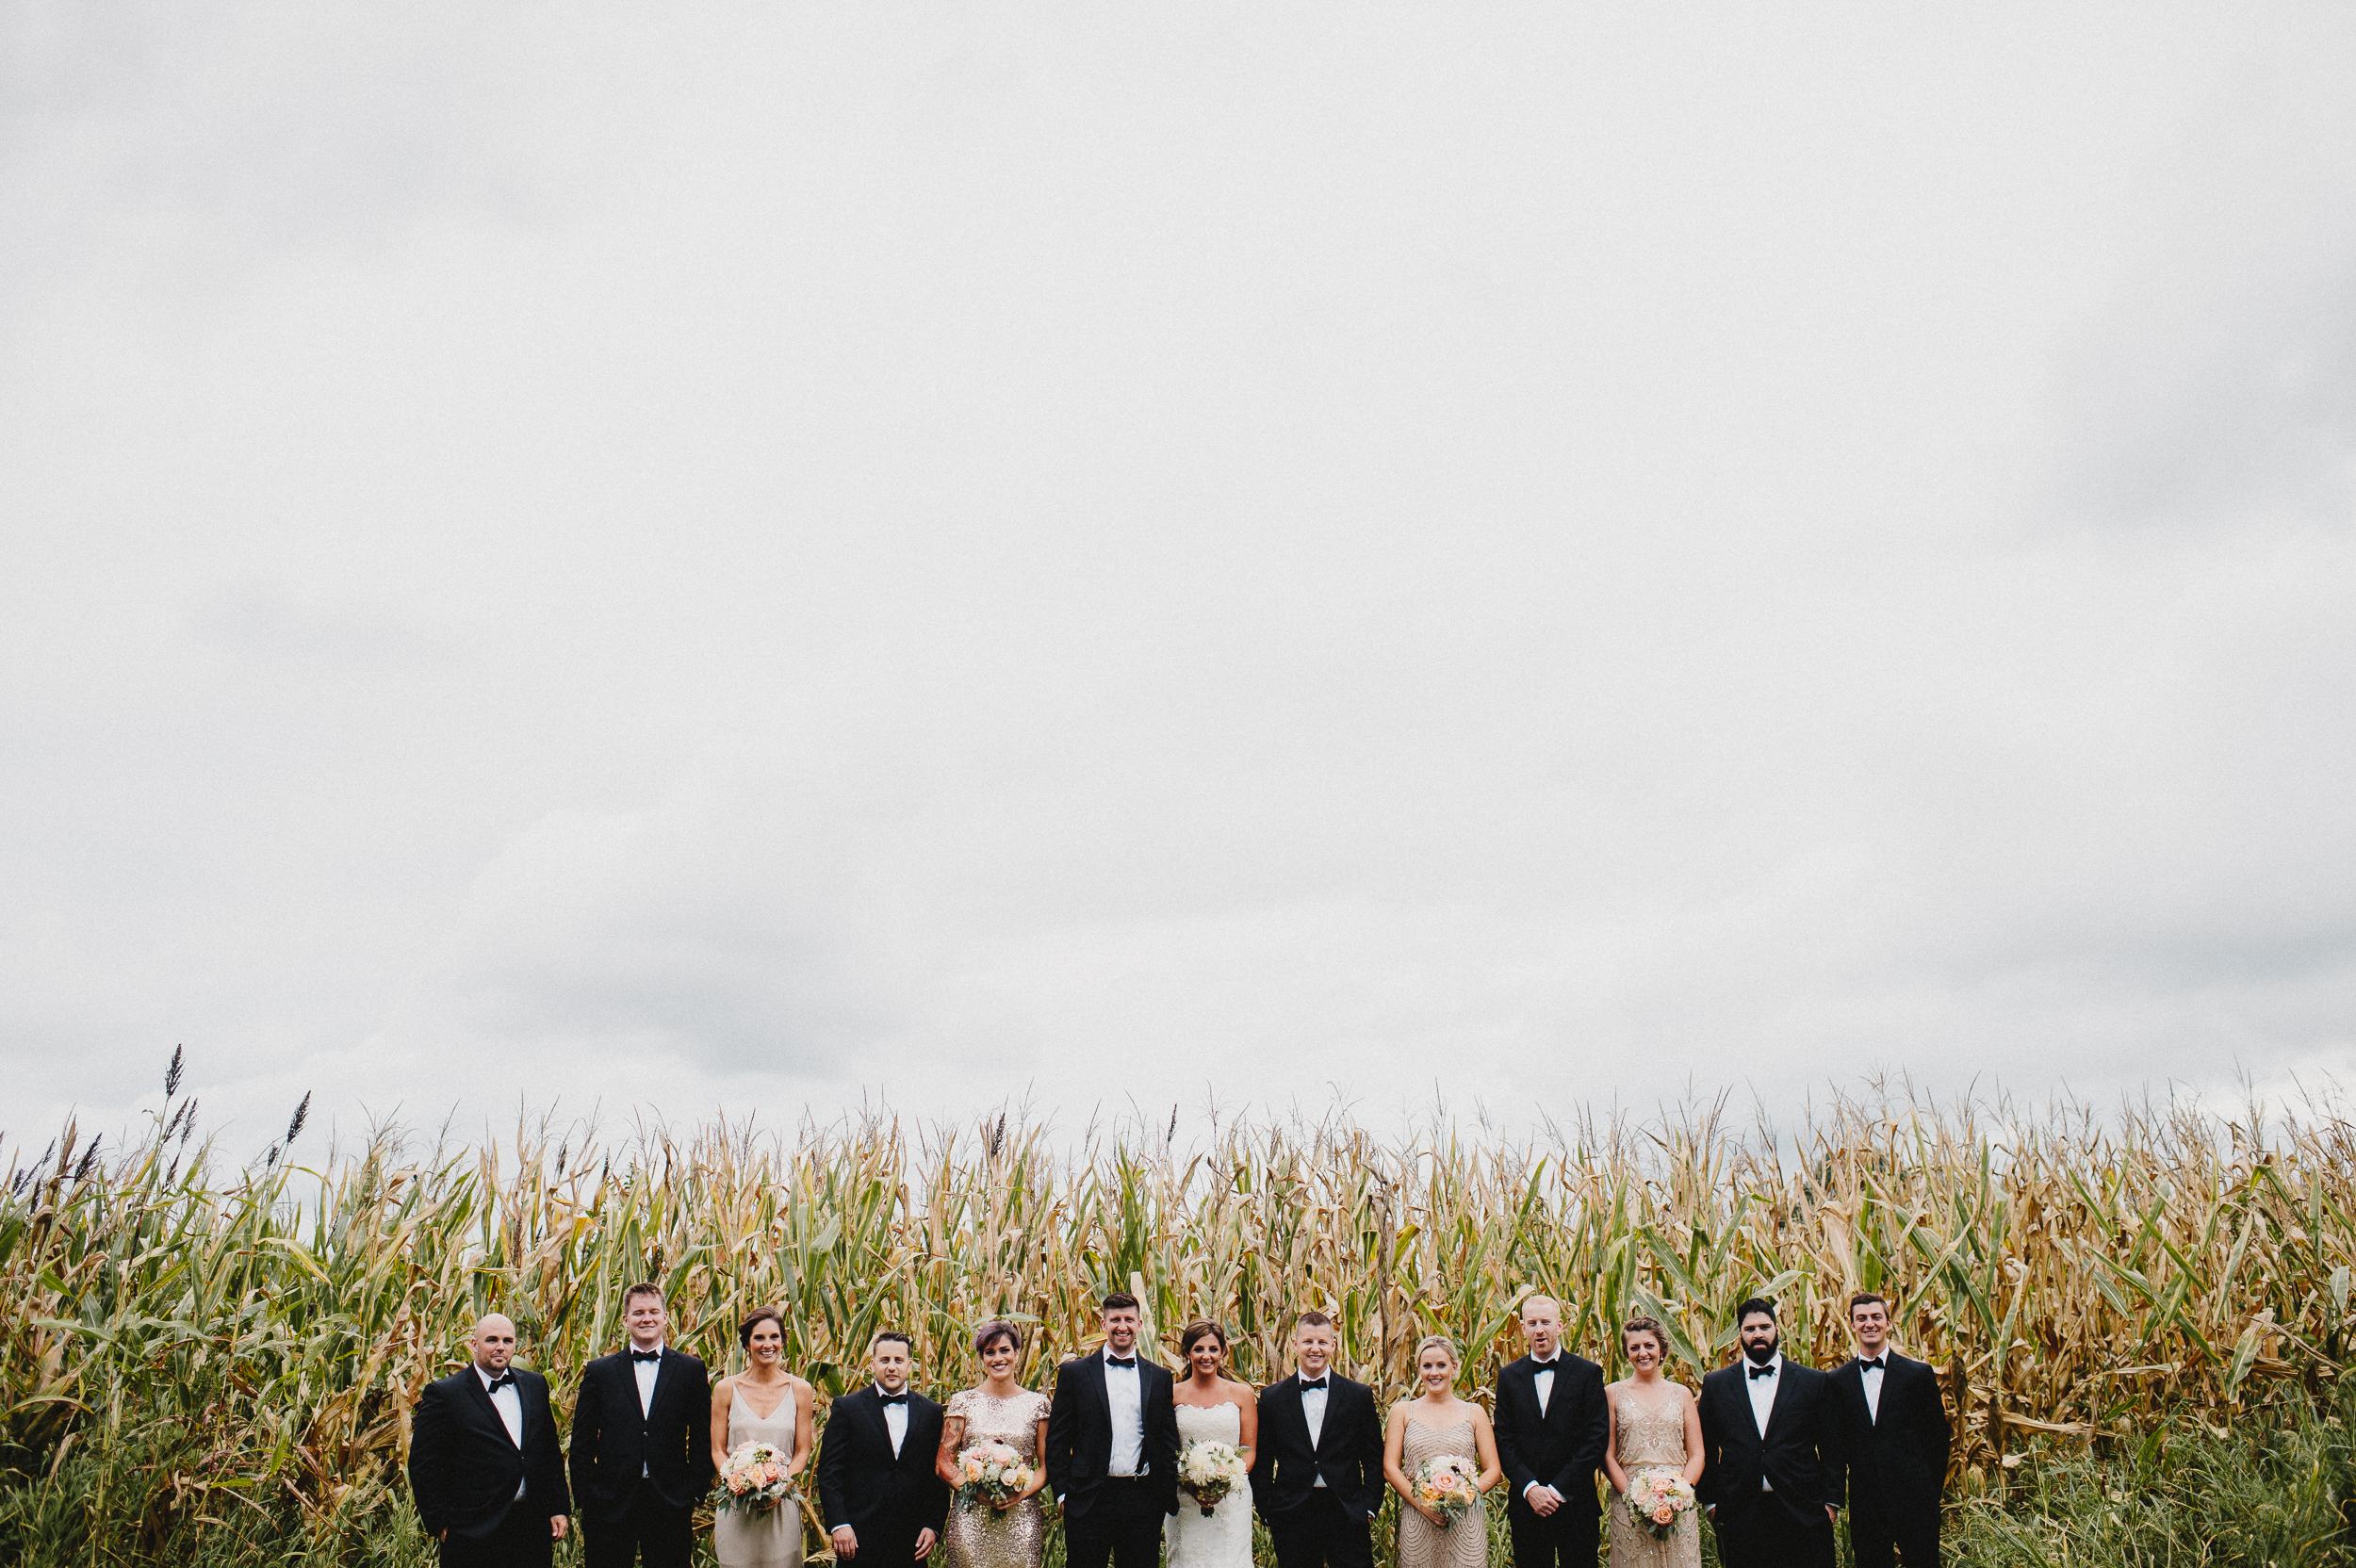 delaware-estate-wedding-photographer-pat-robinson-photography-47.jpg